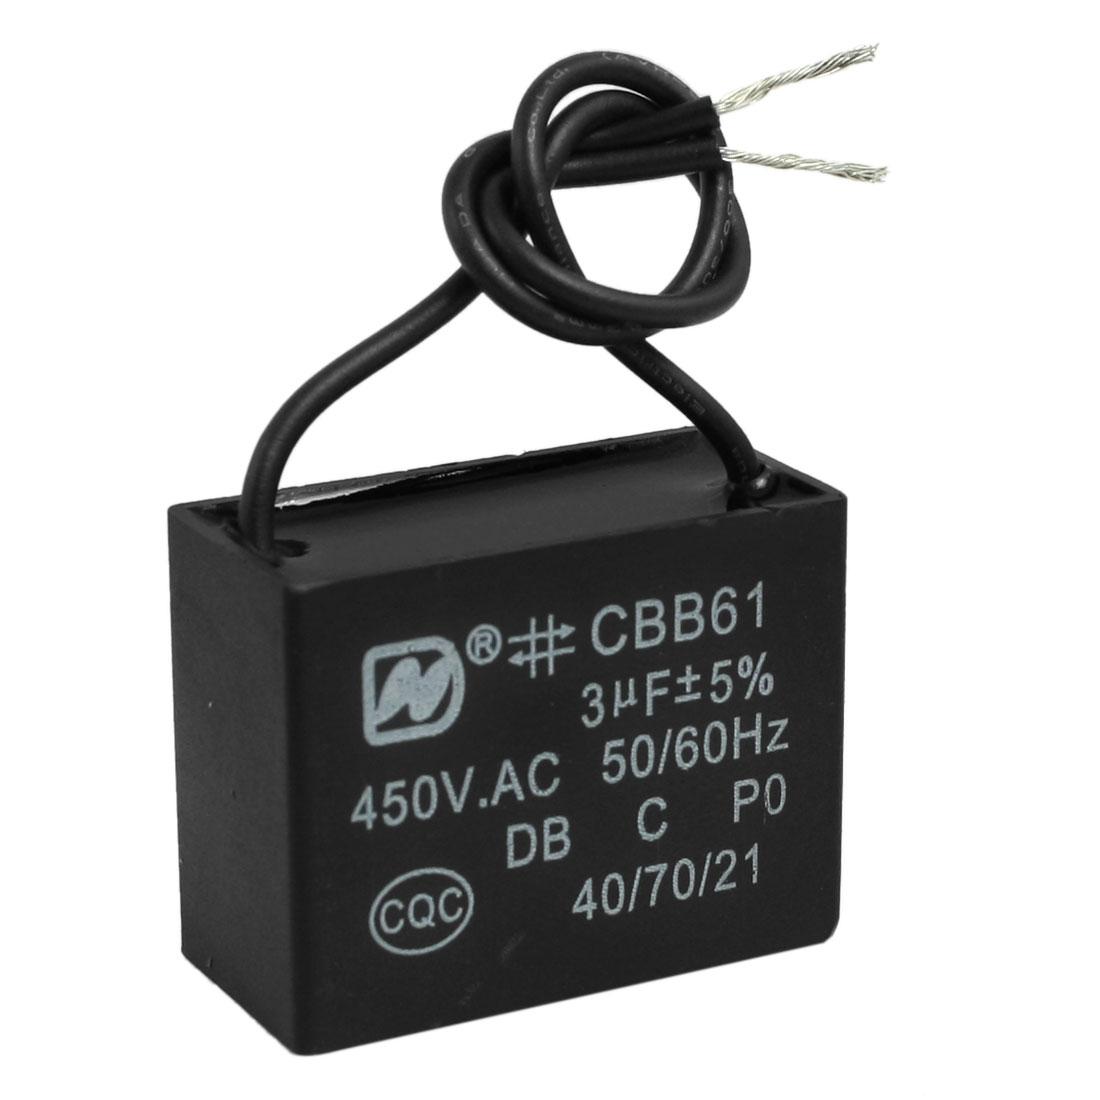 CBB61 AC 450V 3uF 50/60 Hz Wire Motor Run Capacitor